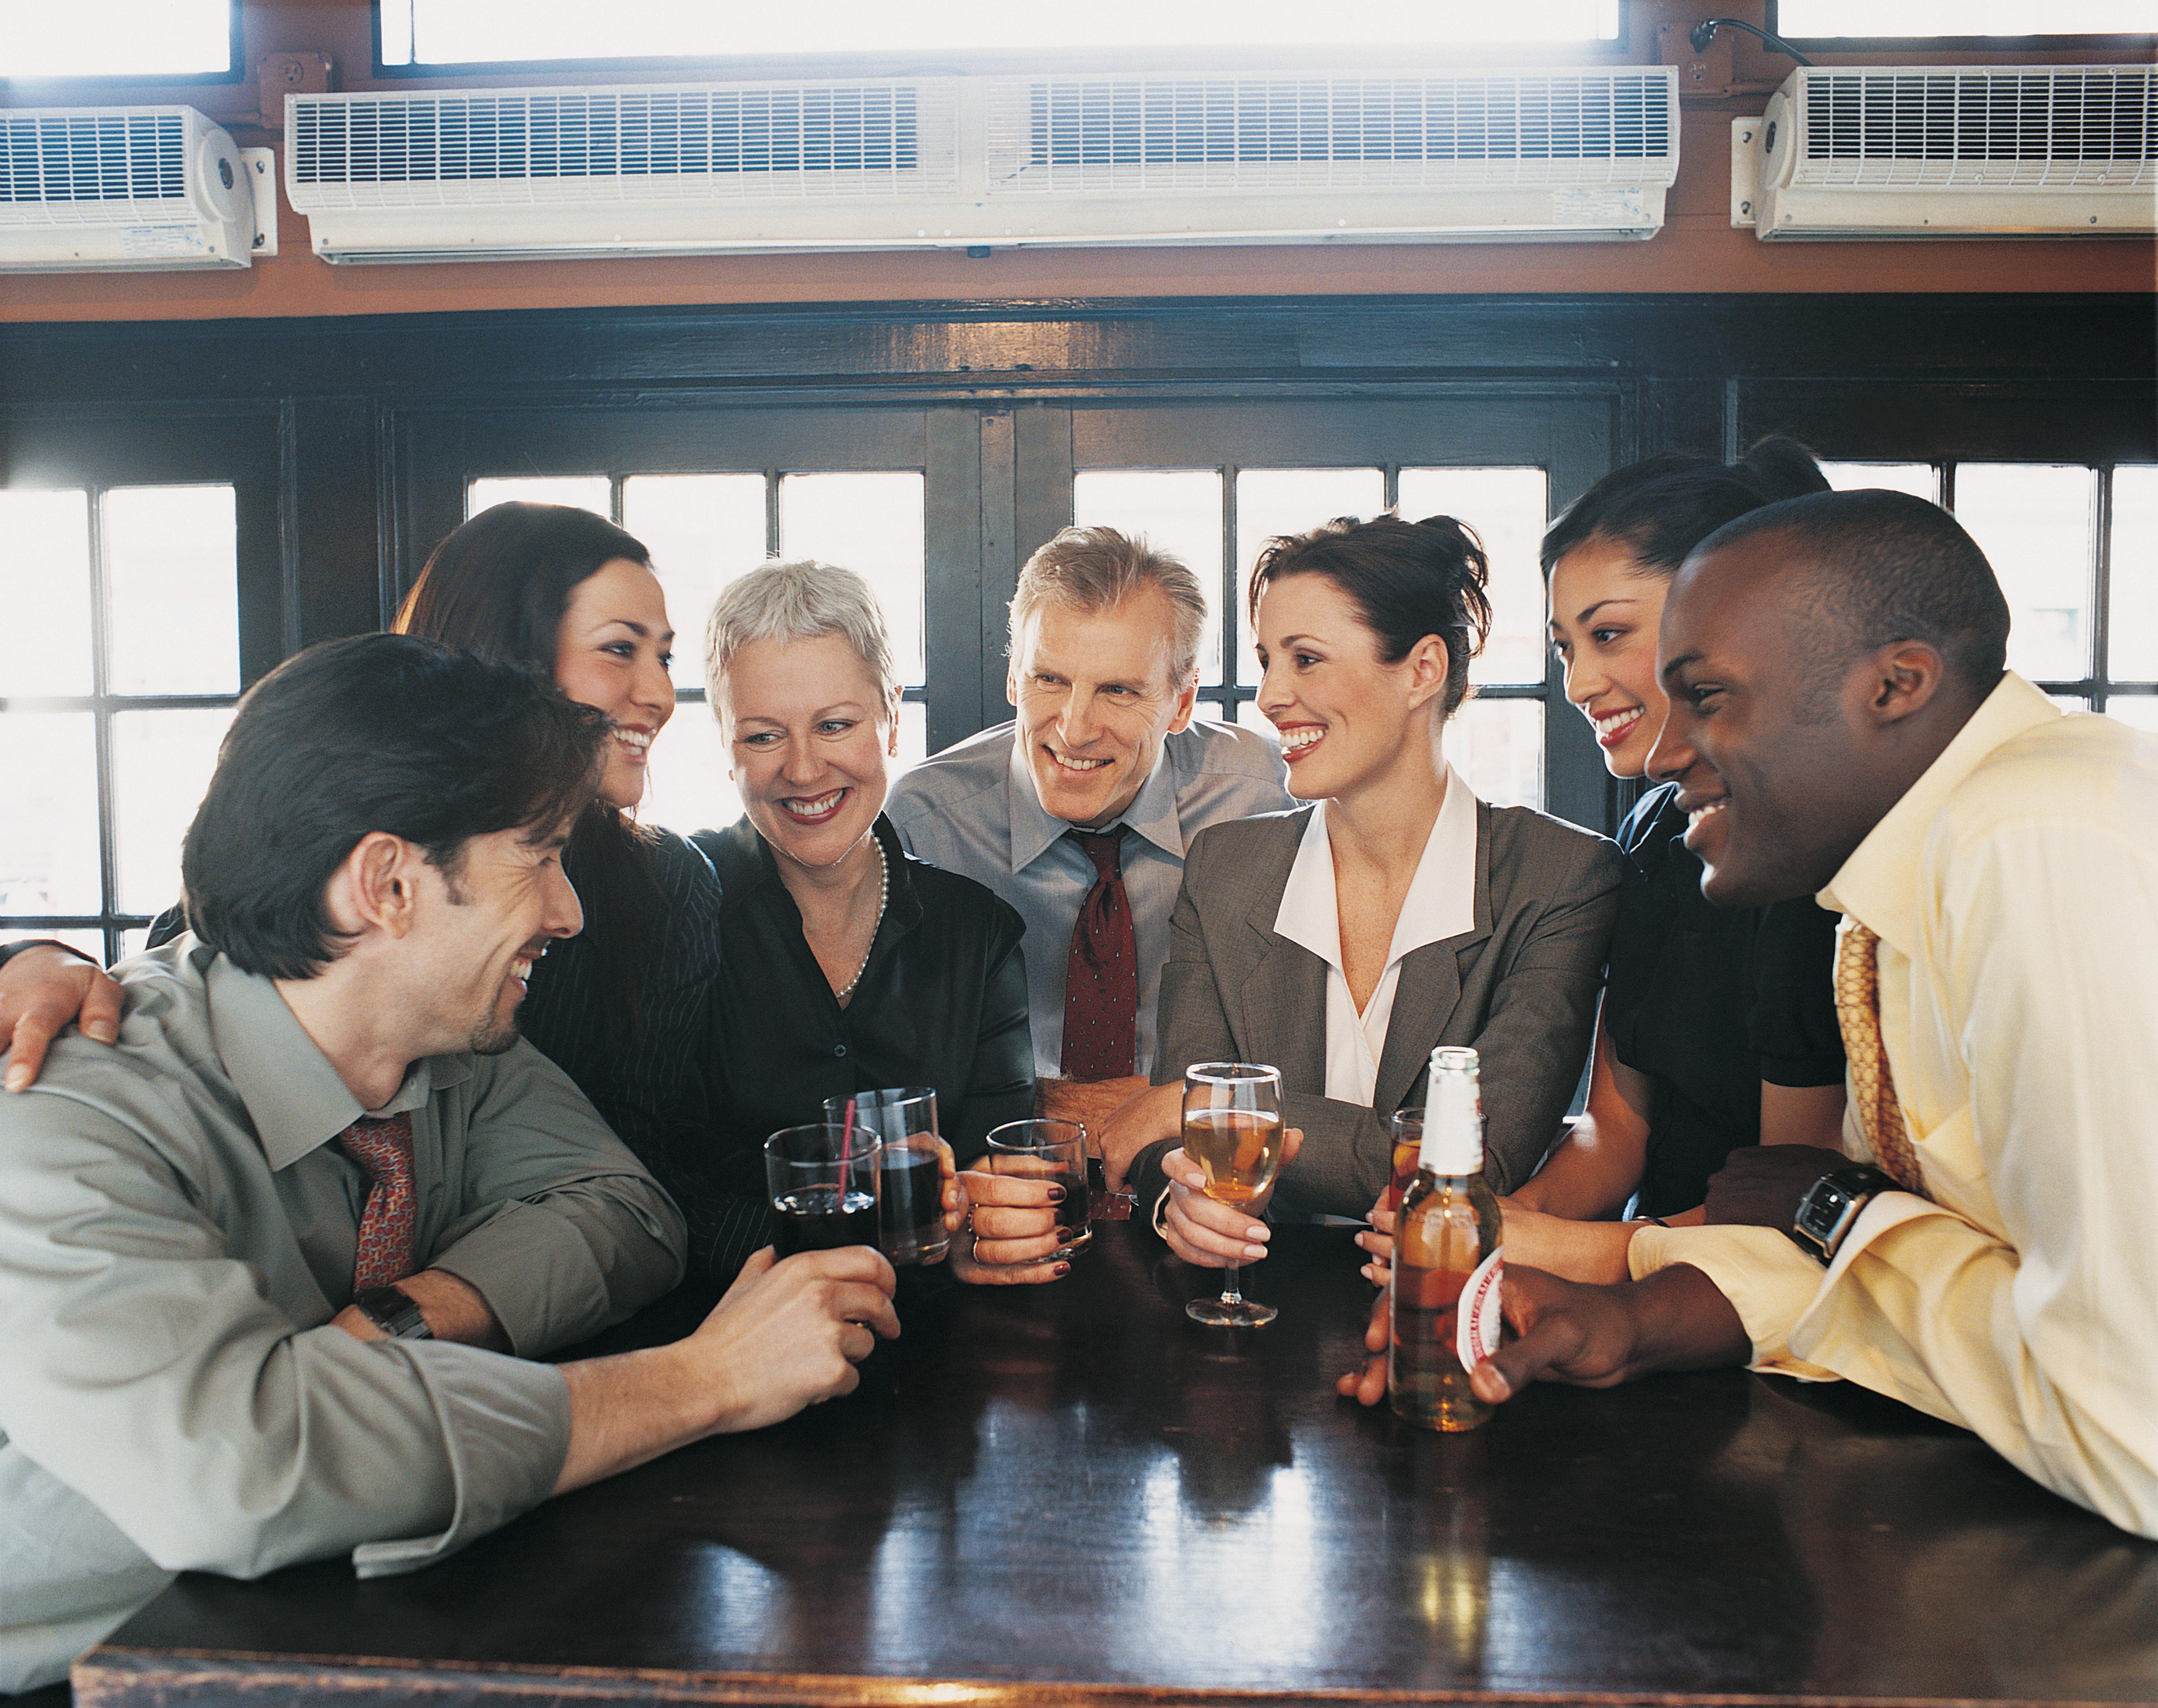 Businessmen and Businesswomen Work Colleagues Enjoying a Drink in a Bar